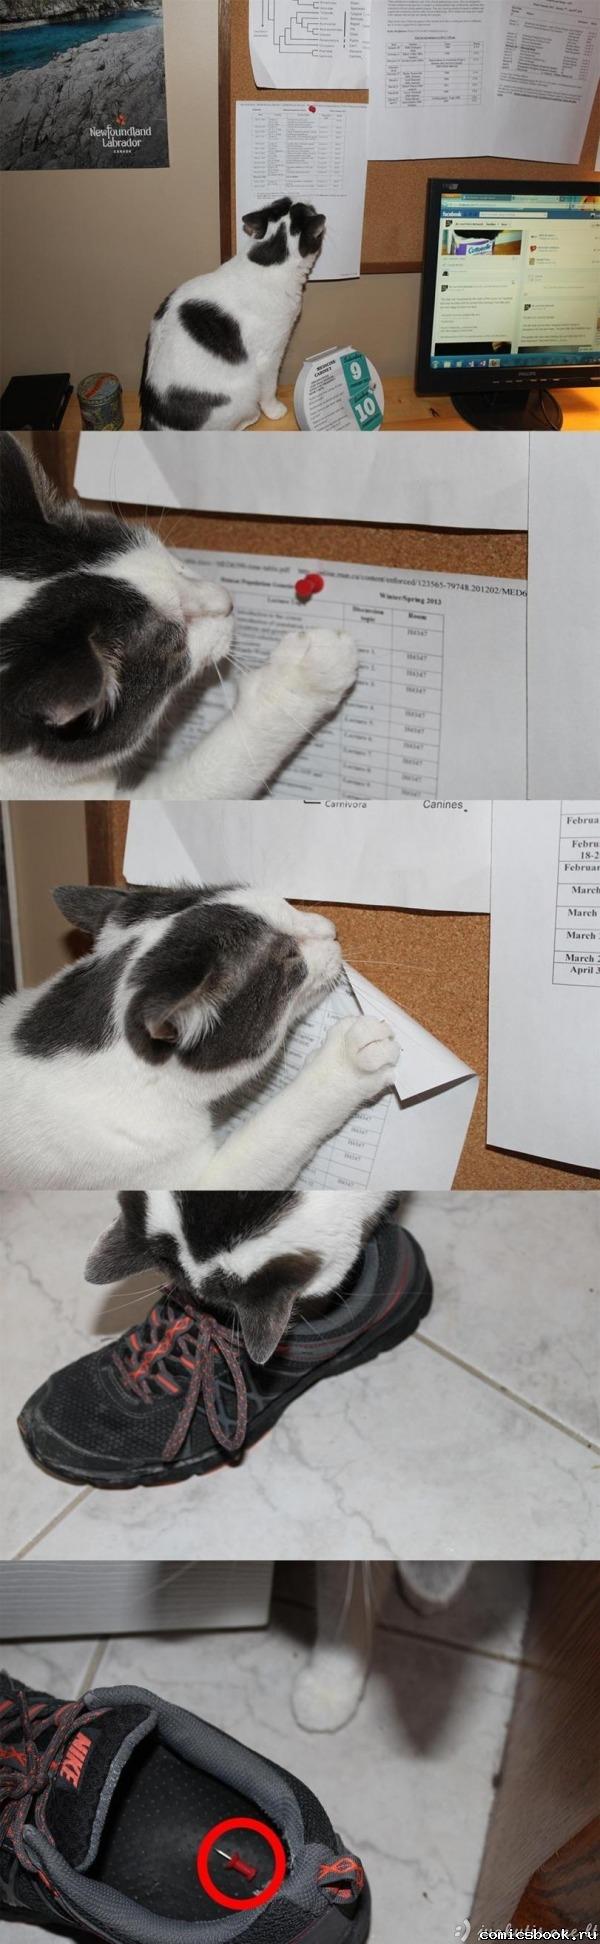 Zapadlistas katinas...